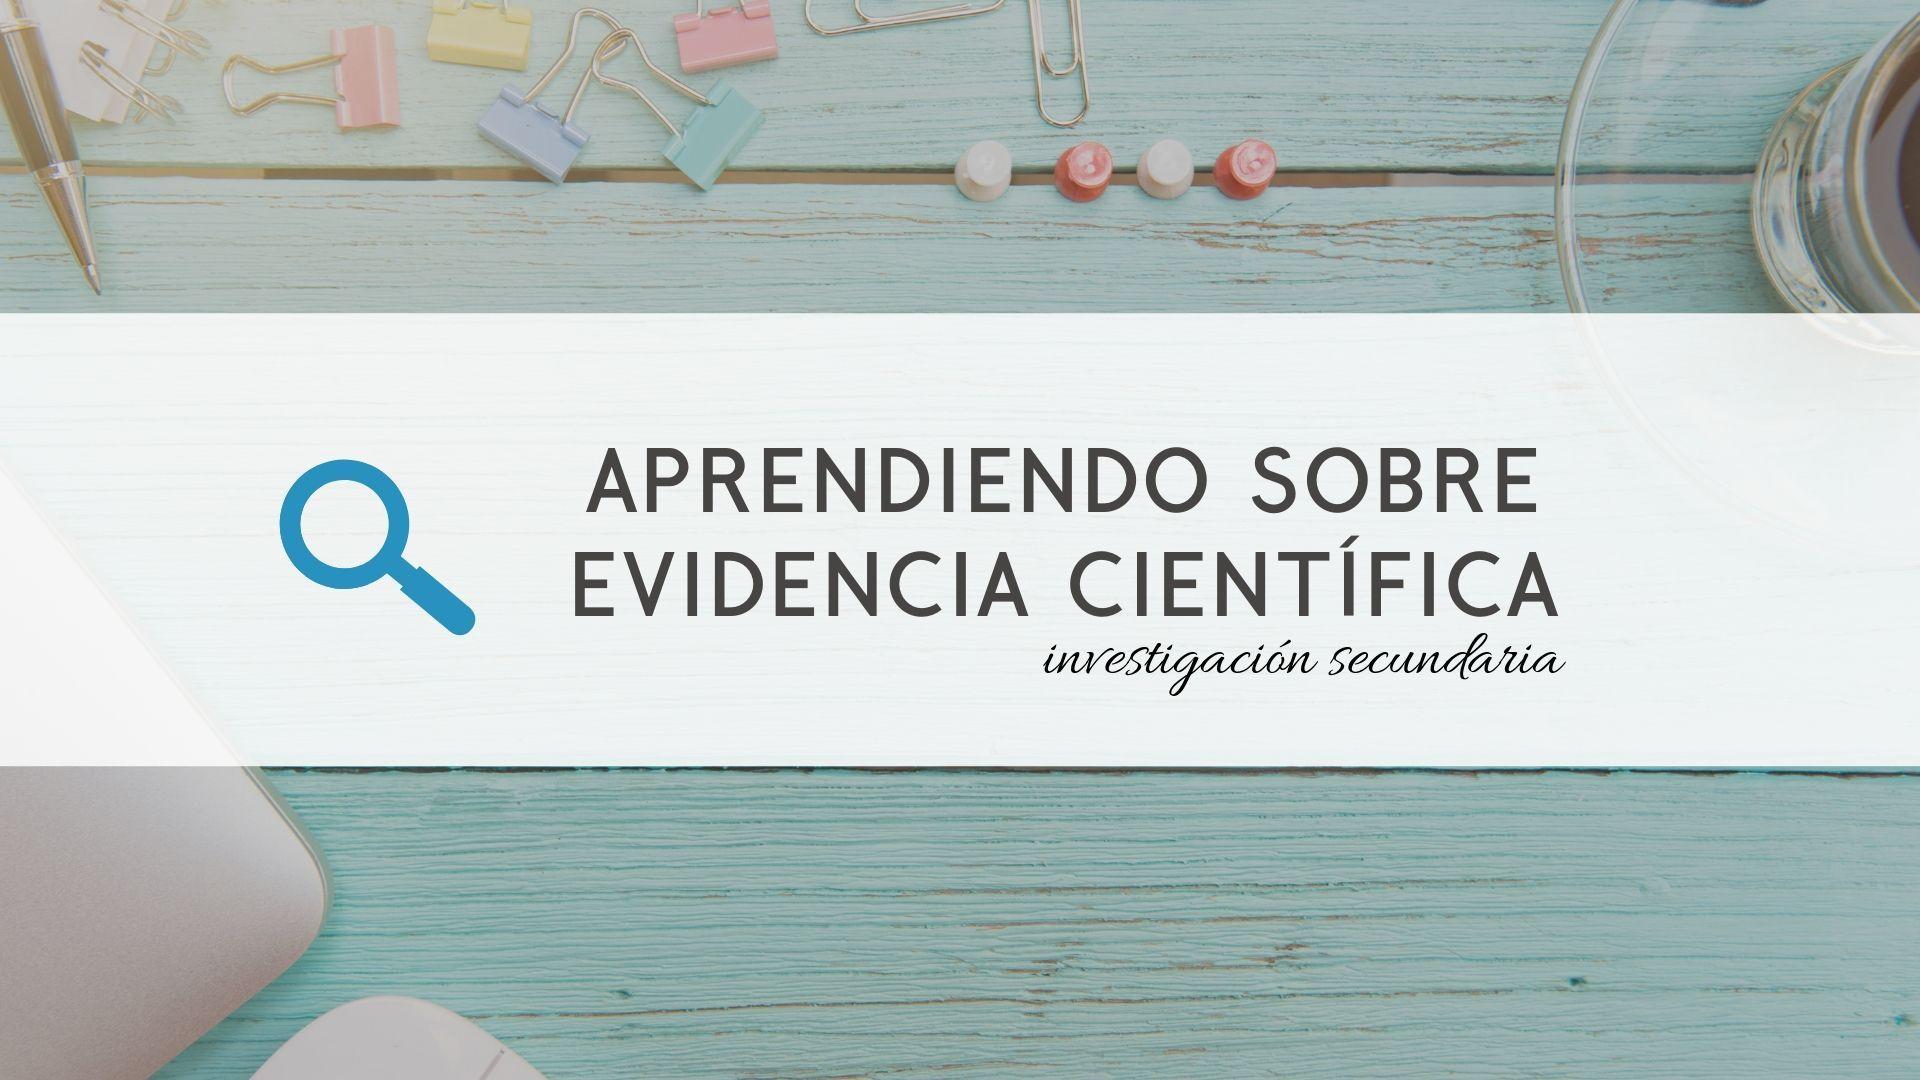 curso-evidencia-cientifica-investigacion-secundaria (2)